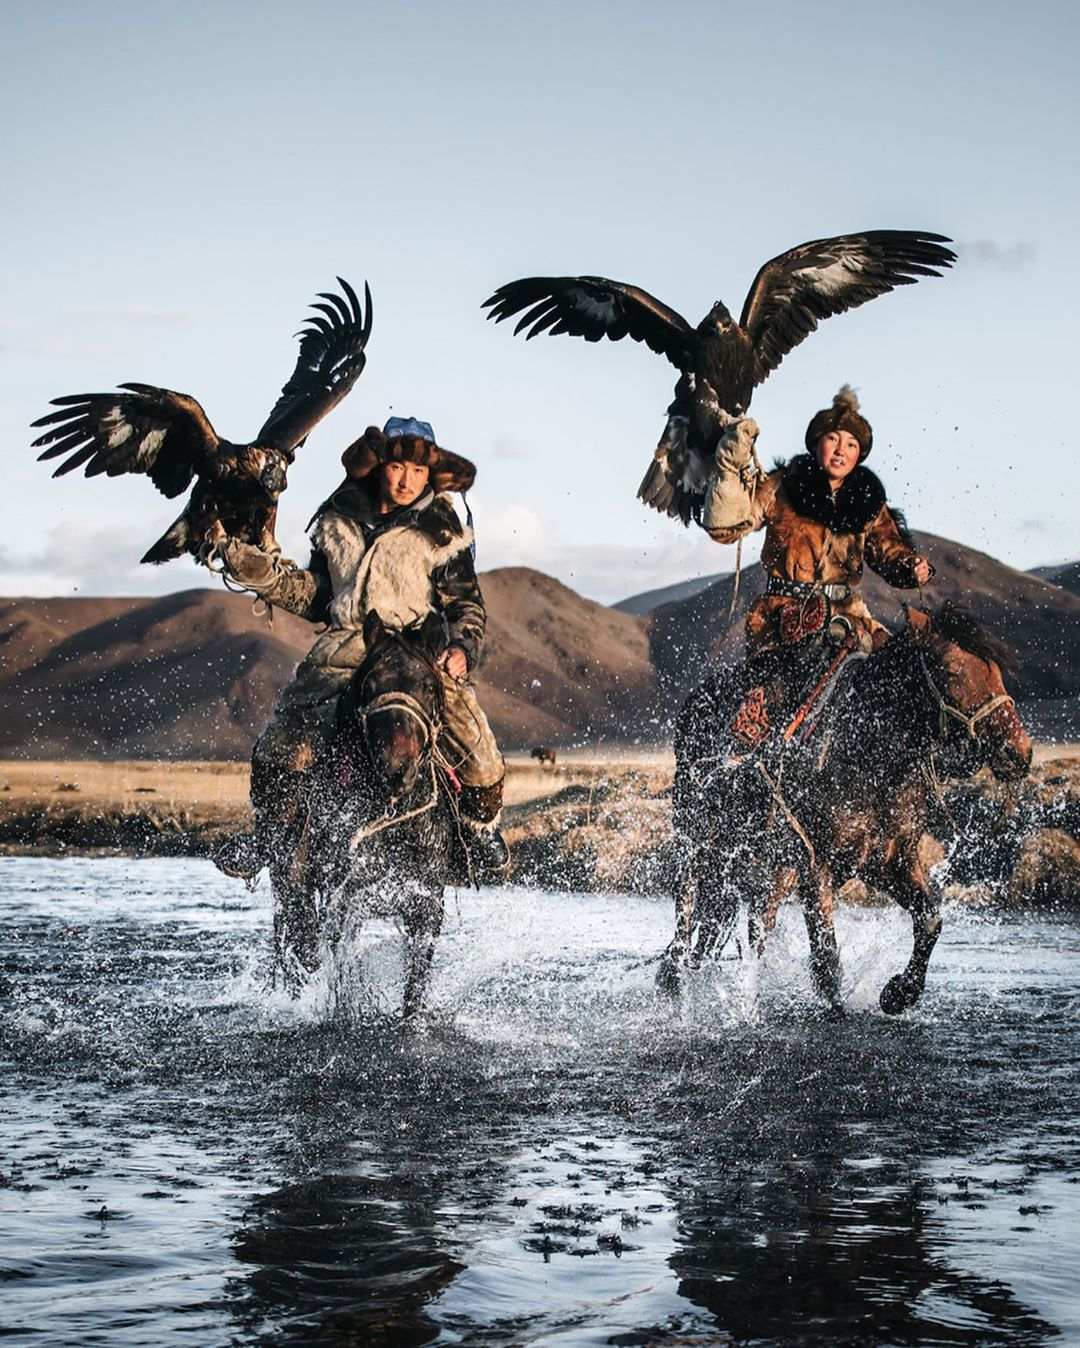 Приключения и путешествия на снимках Джаррада Сенга